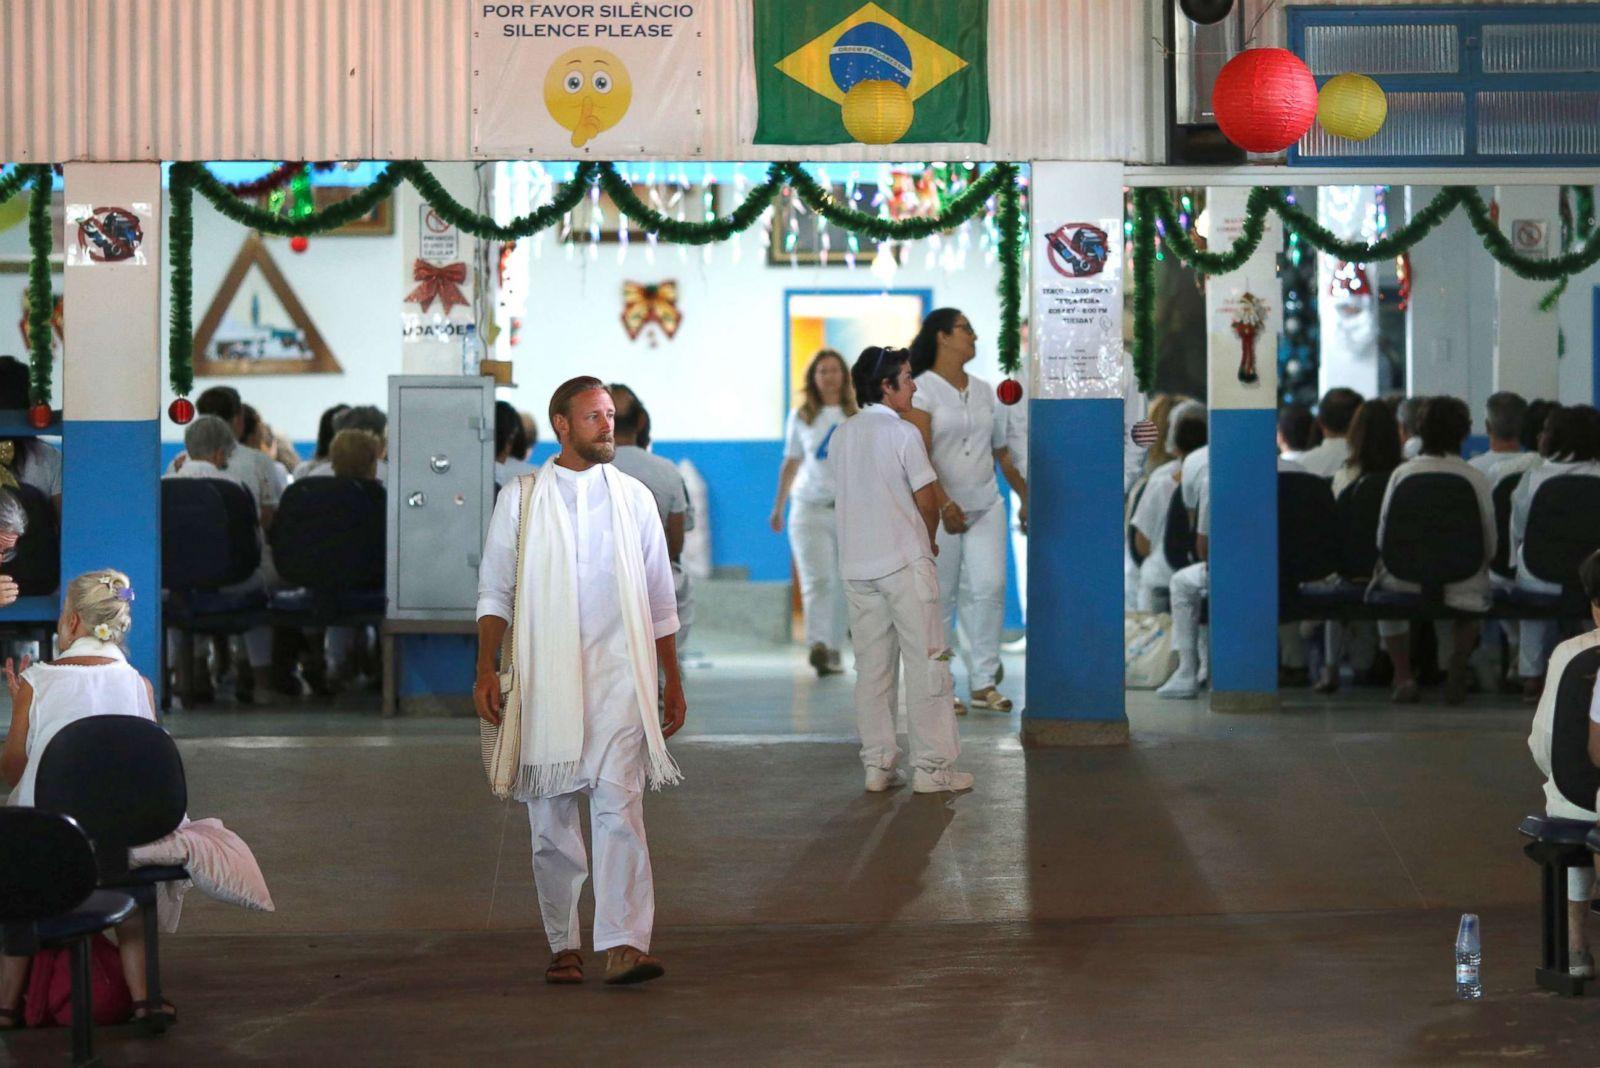 Brazilian spiritual healer 'John of God' indicted for rape, accused